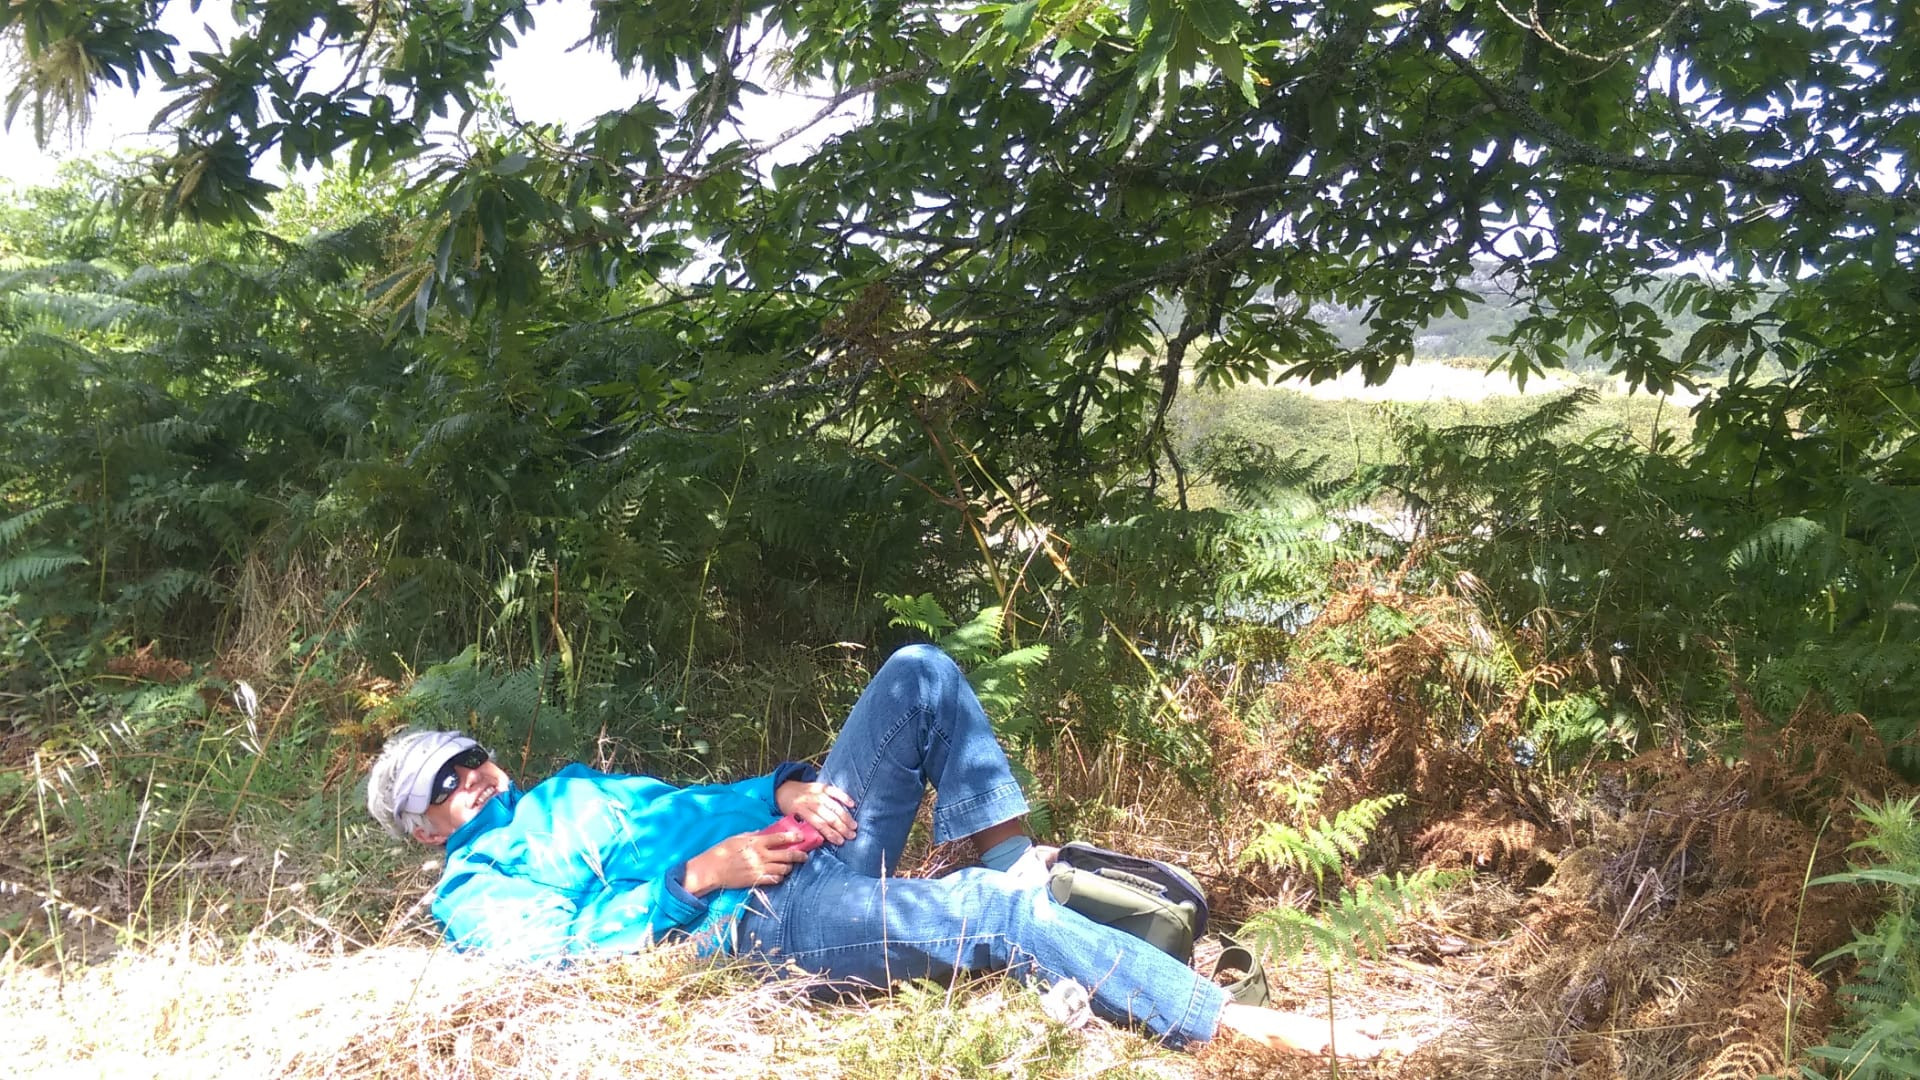 Lying under a tree